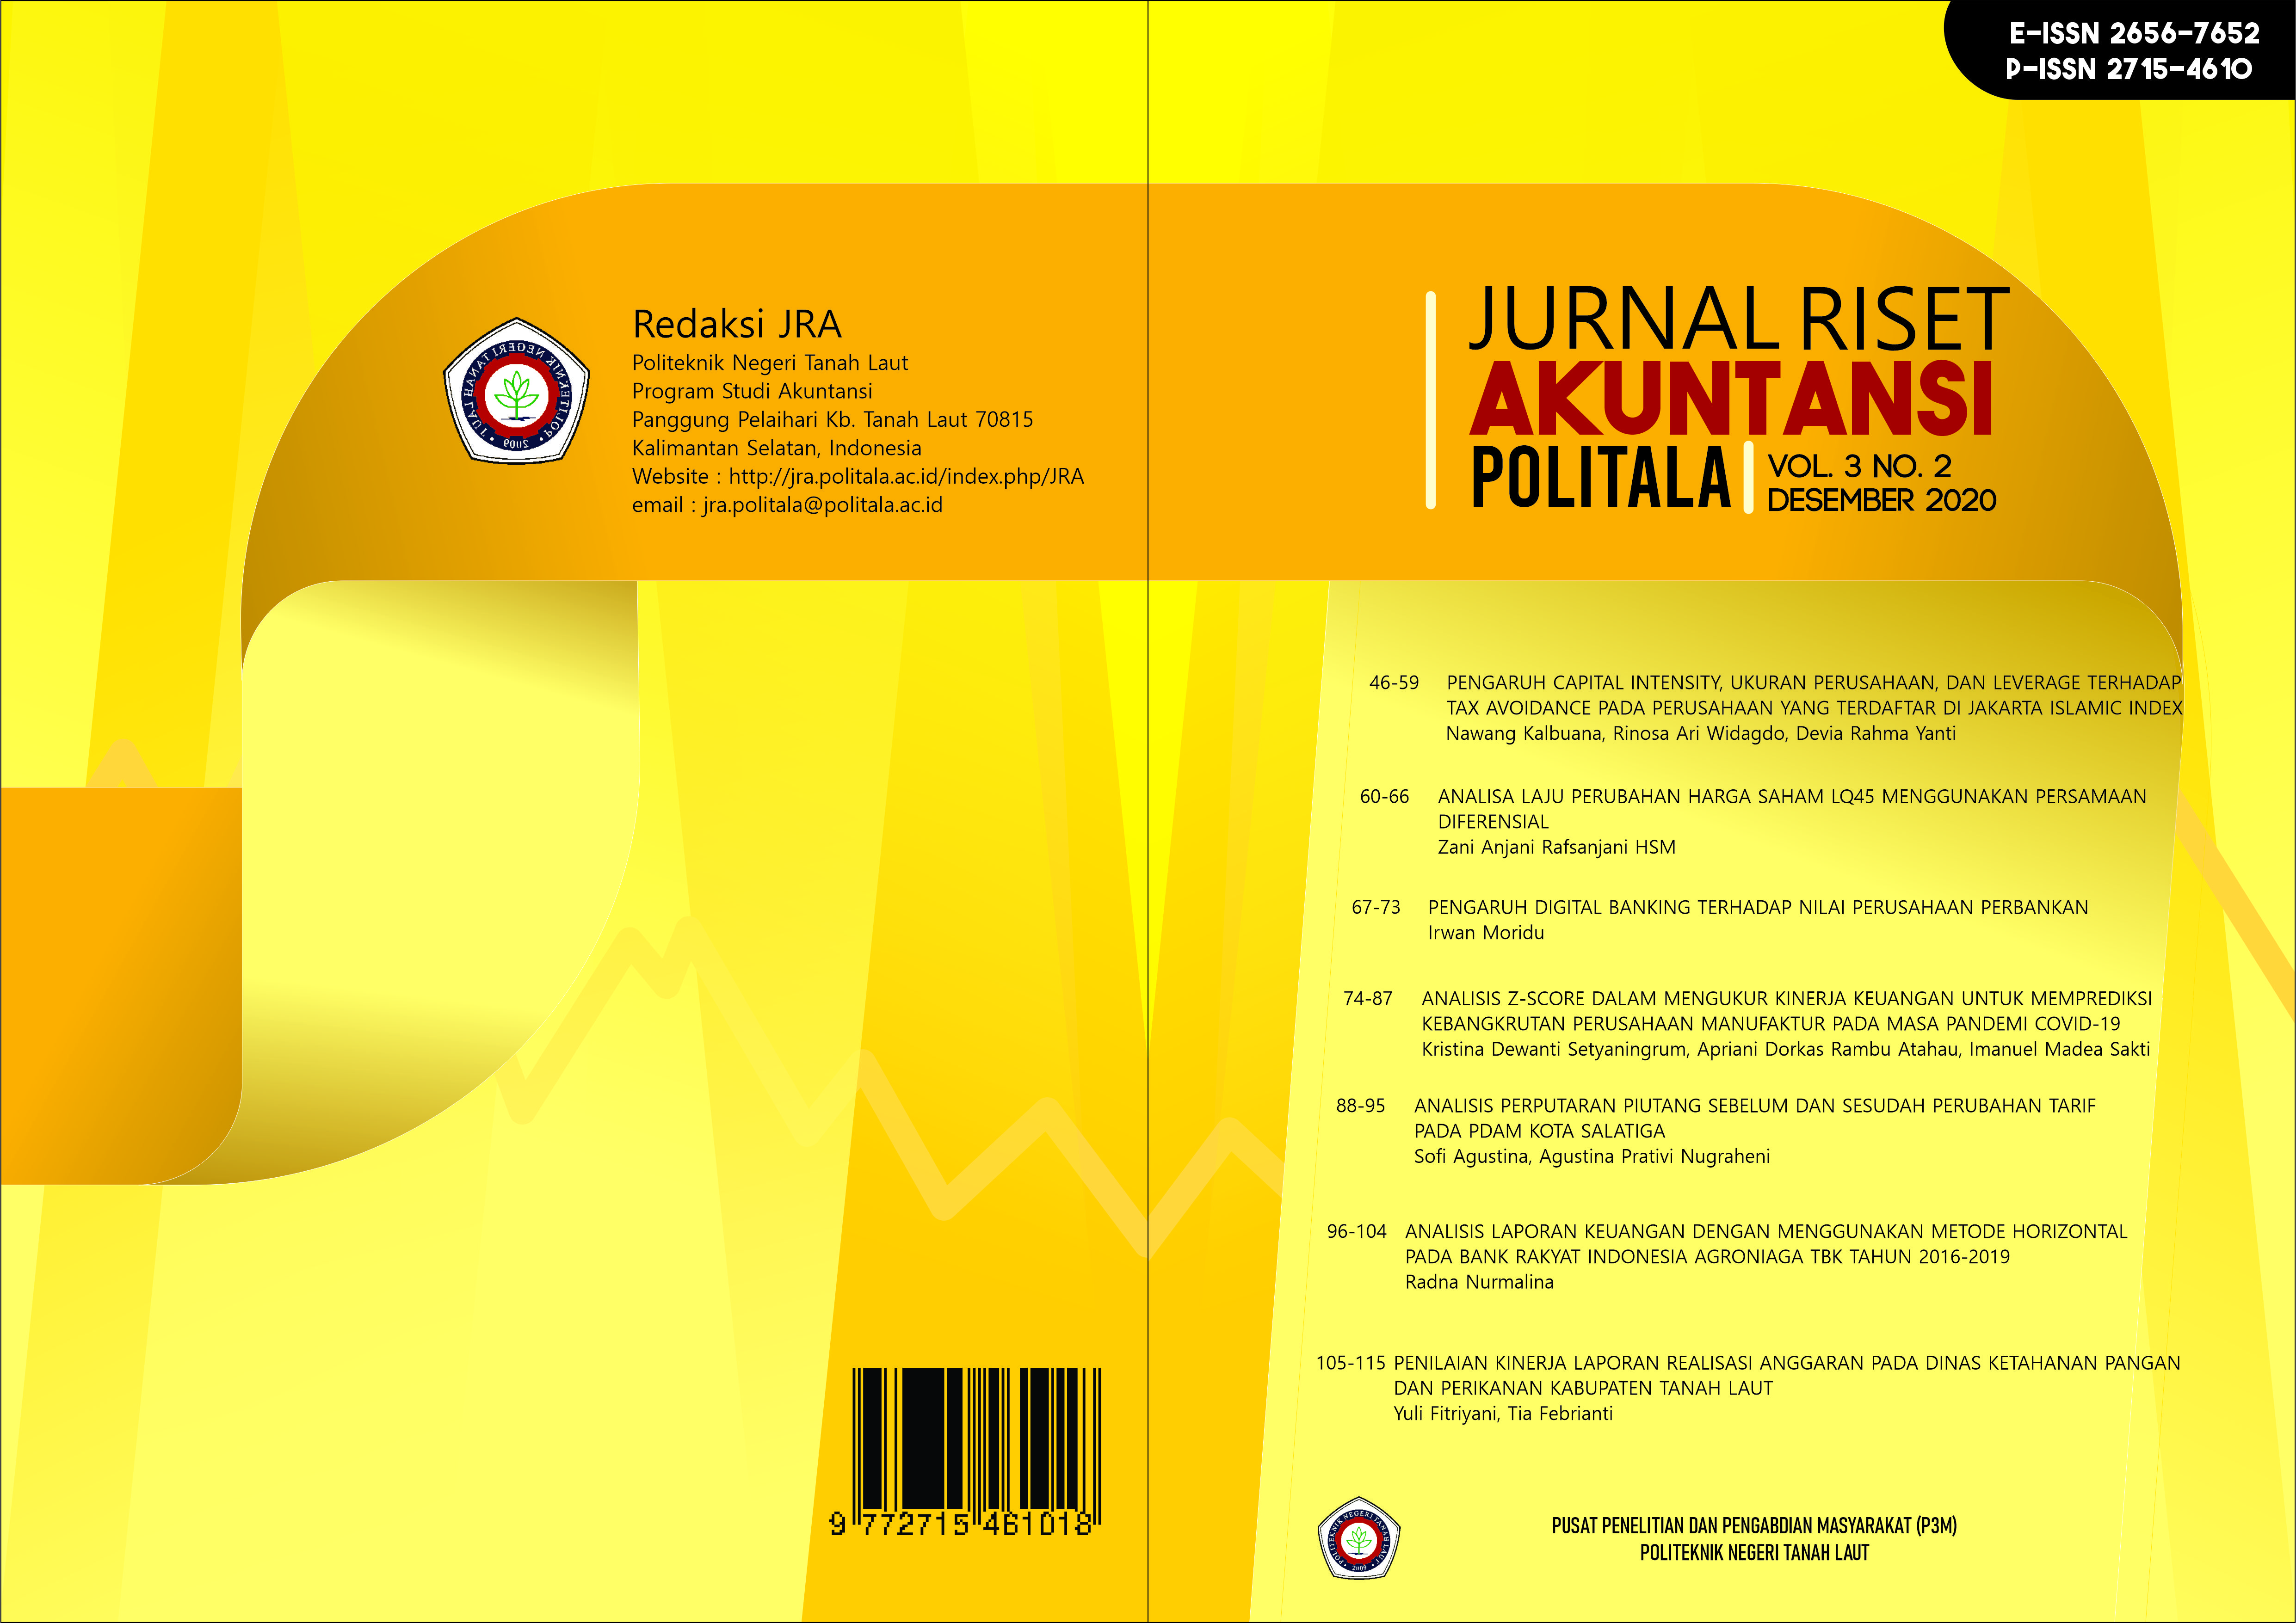 View Vol. 3 No. 2 (2020): Jurnal Riset Akuntansi Politala